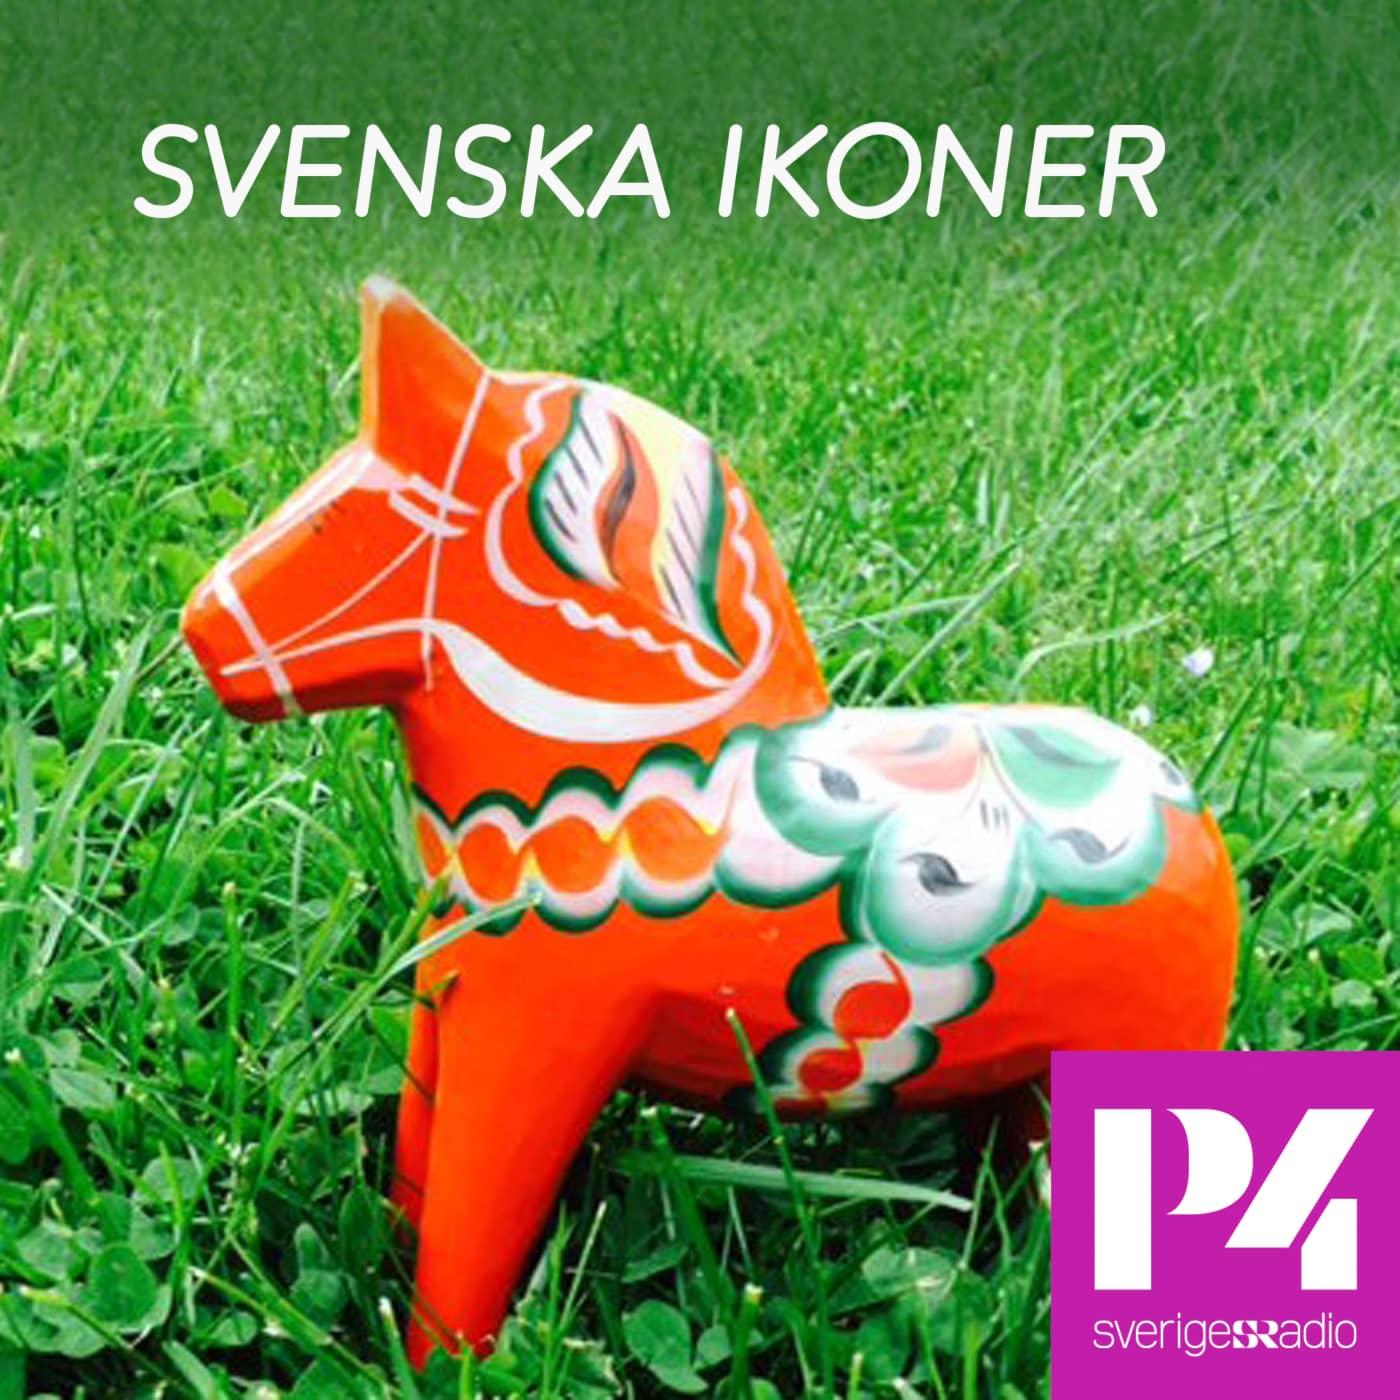 Svenska ikoner